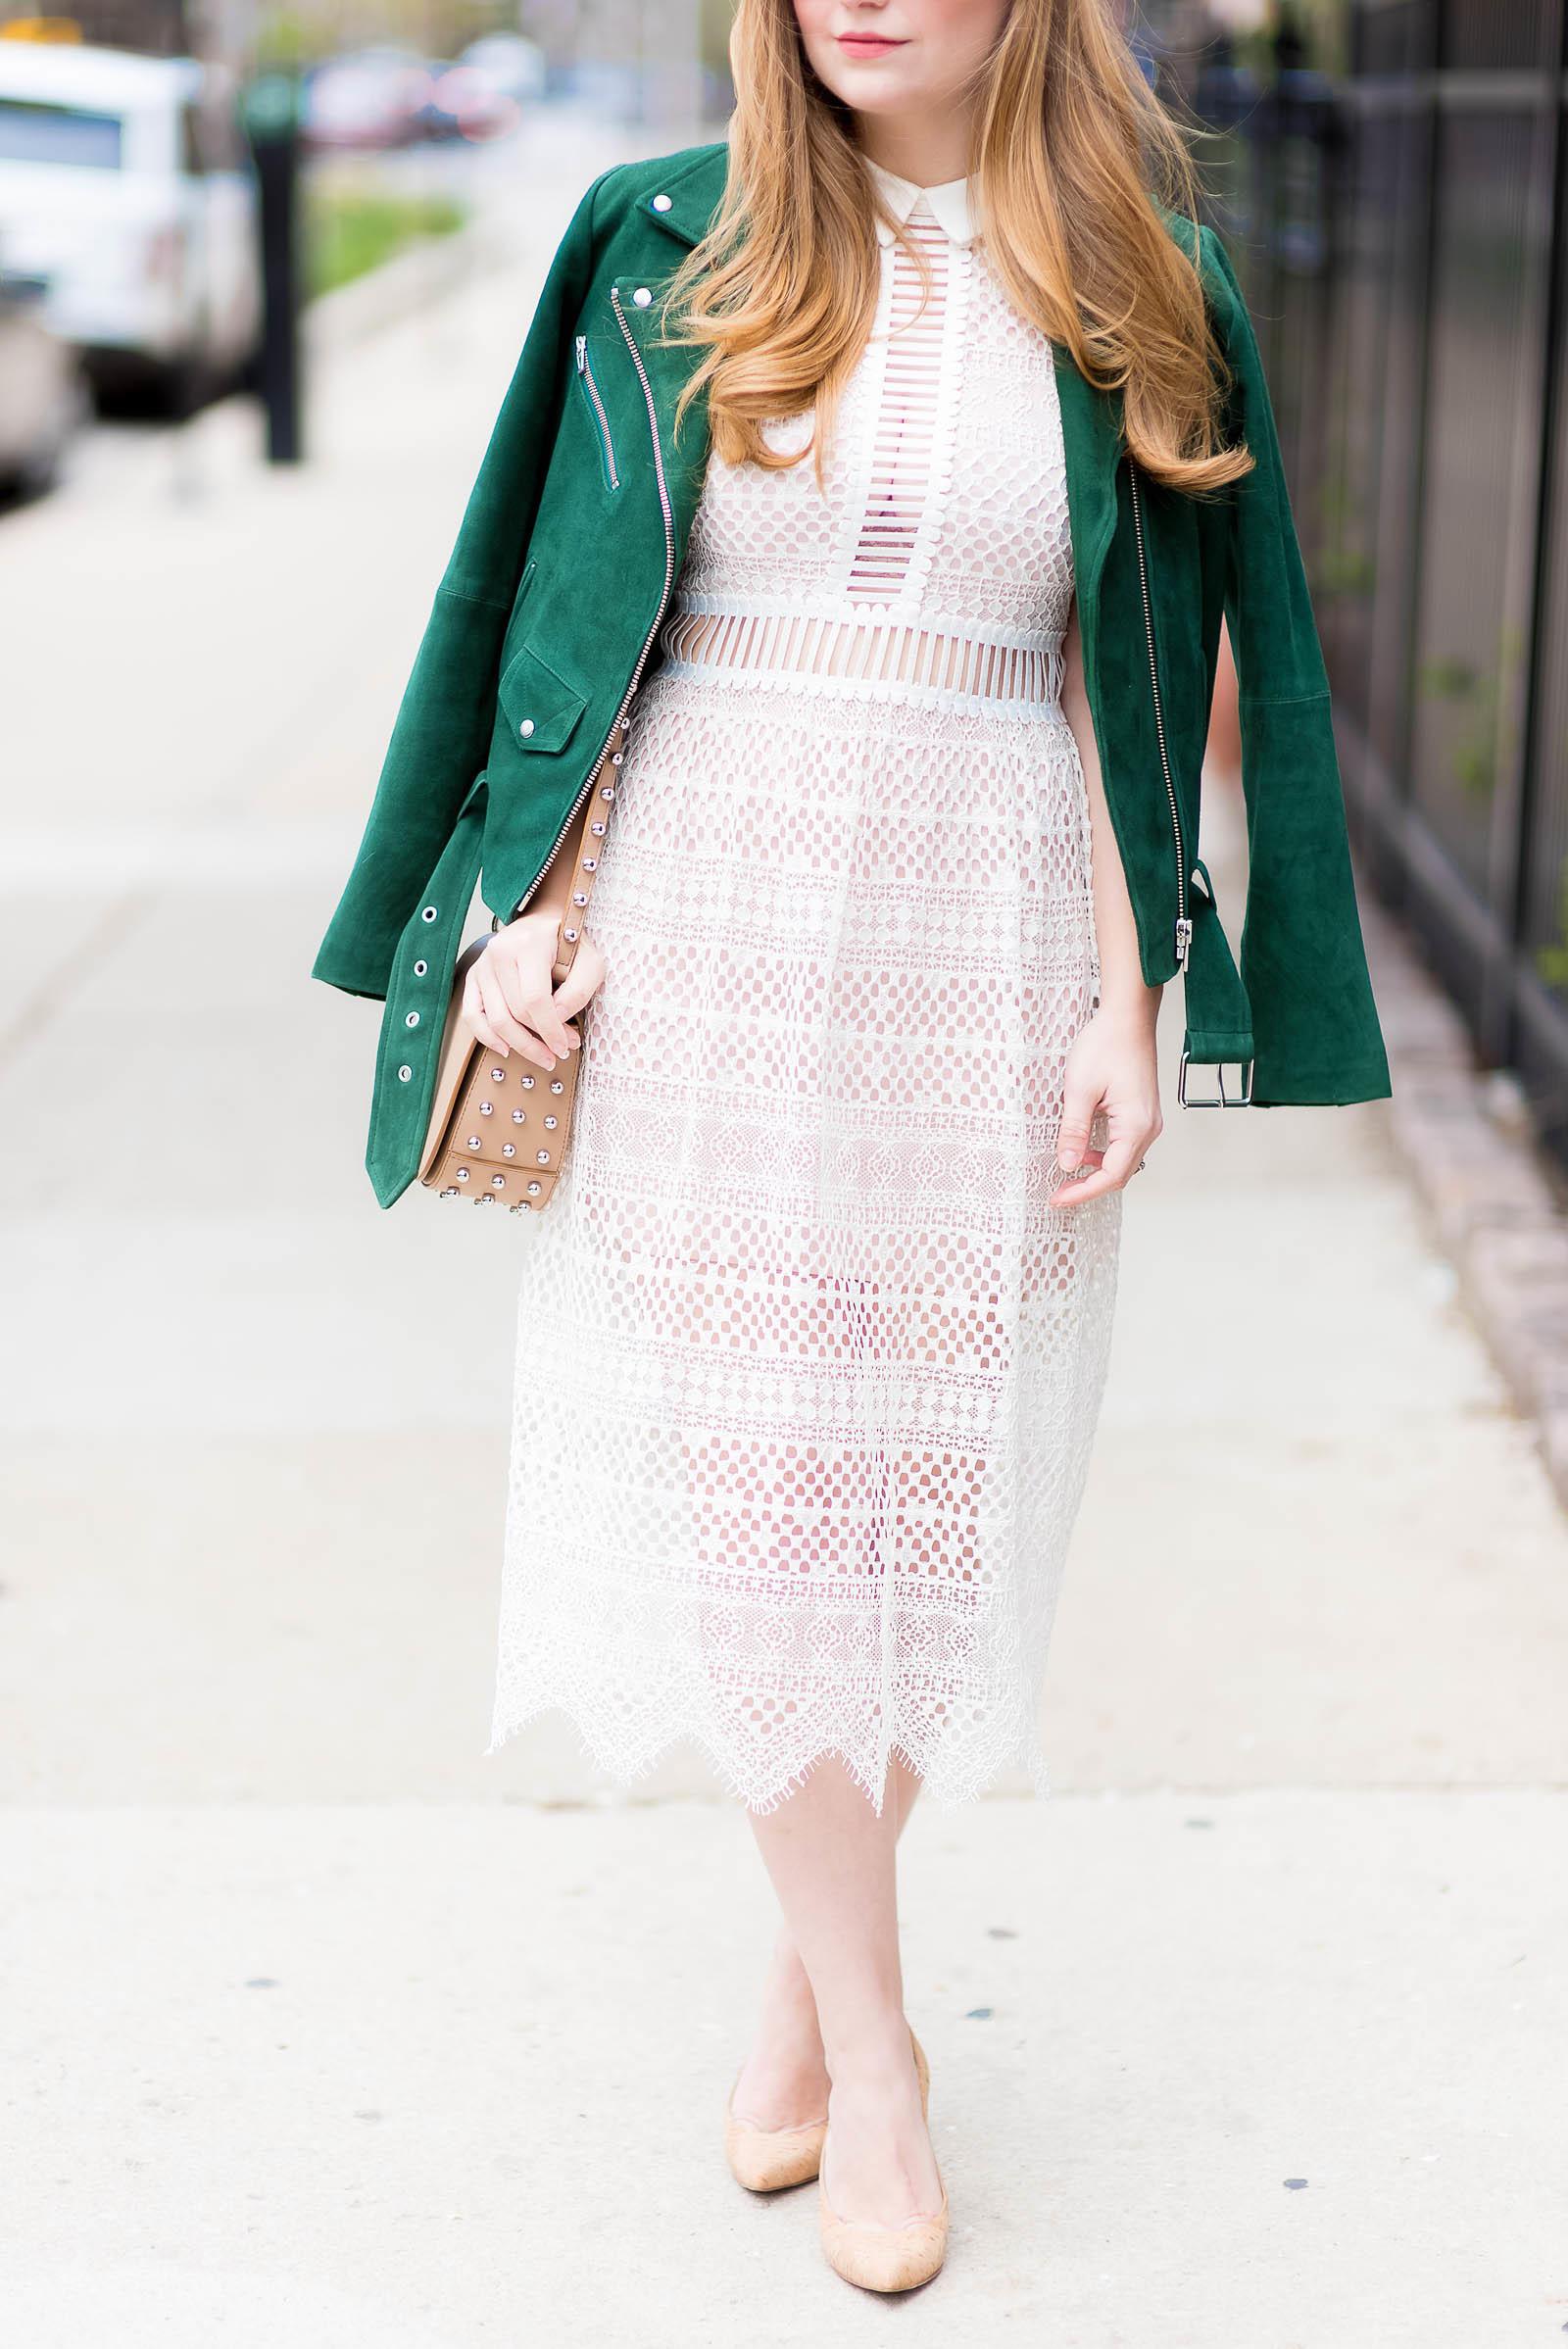 Green Suede Moto Jacket Lace Dress Stud Bag